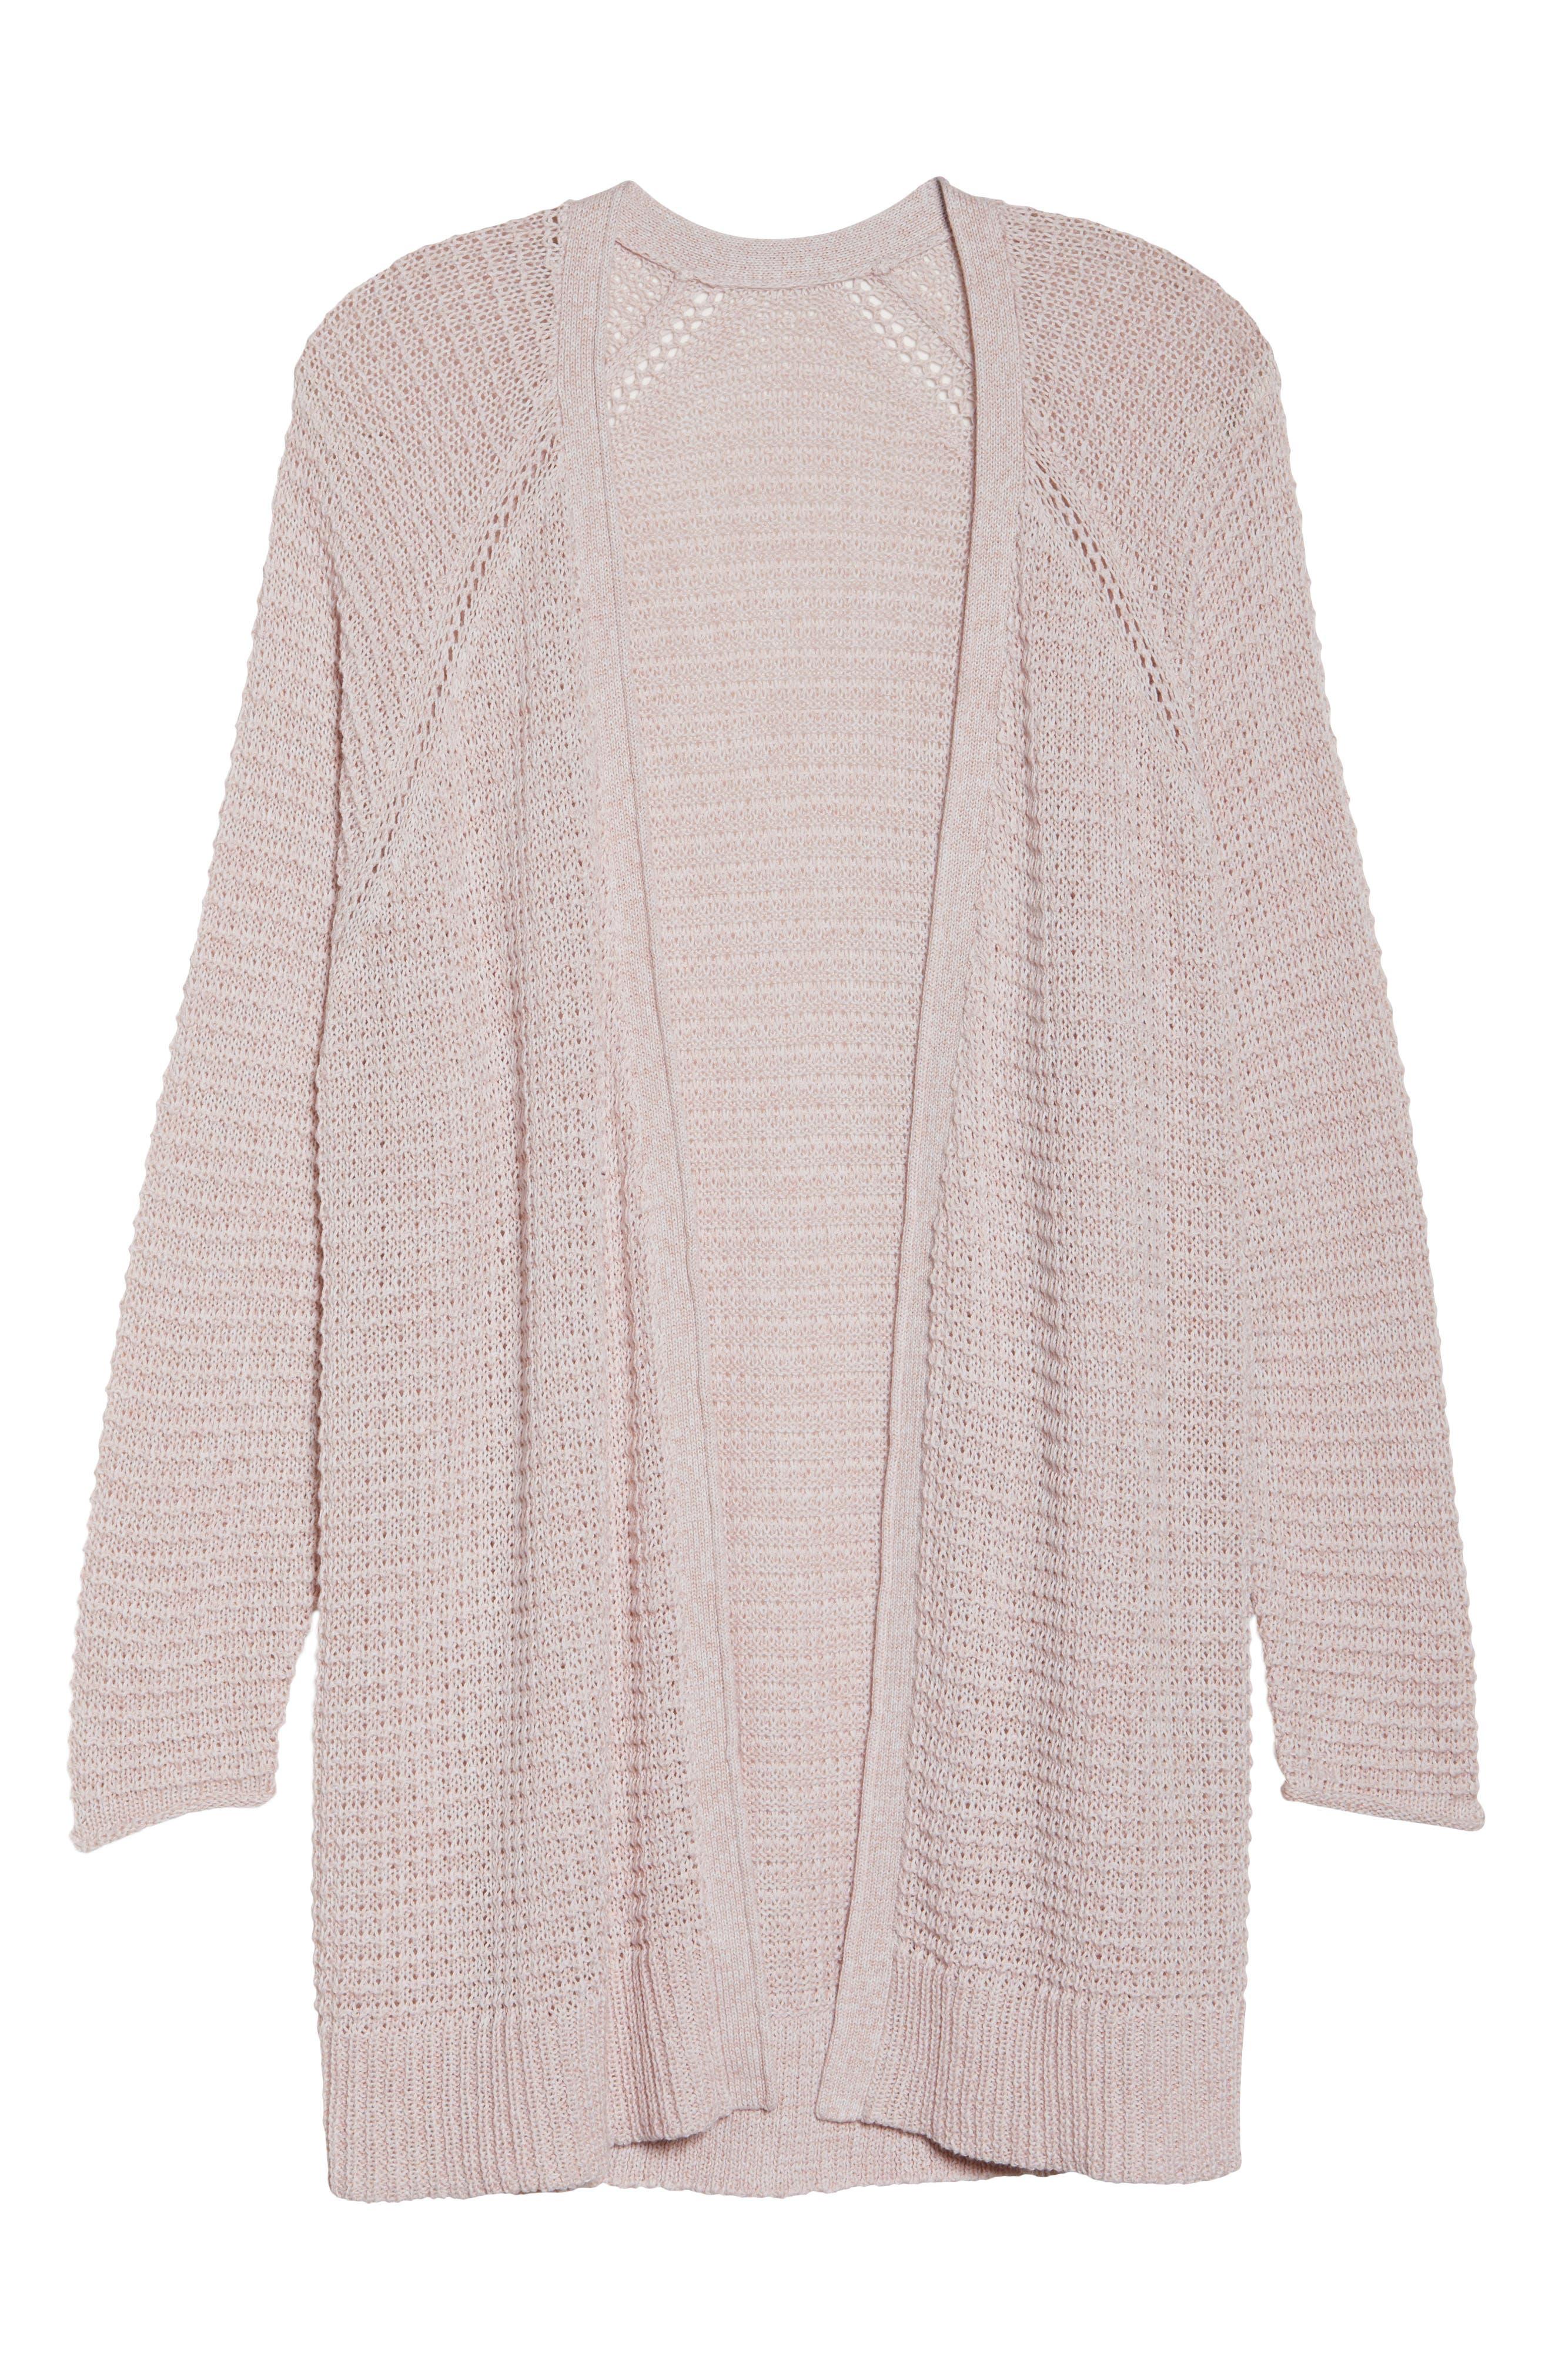 Easy Knit Cardigan,                             Alternate thumbnail 6, color,                             Beige Linen Fern Marl